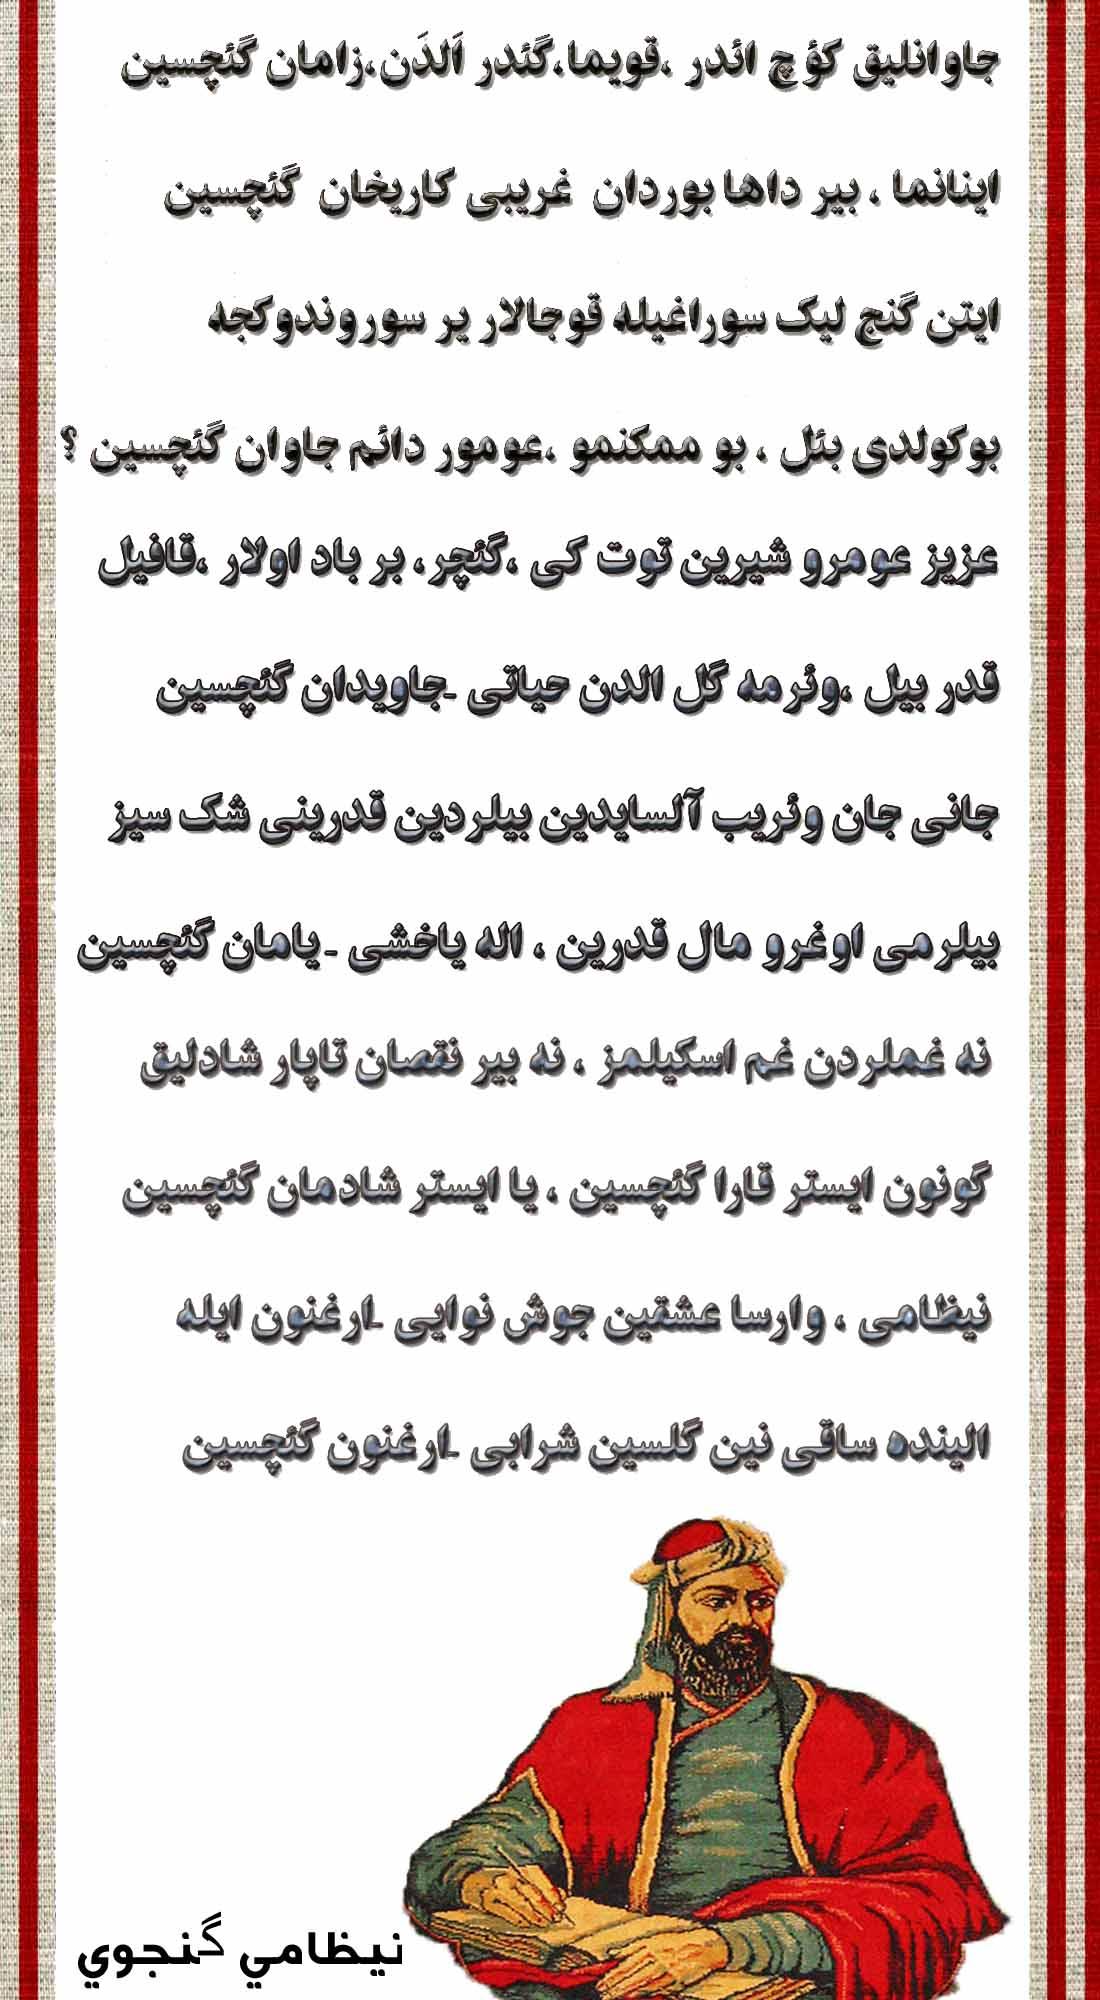 http://bayram.arzublog.com/uploads/bayram/nezami.jpg